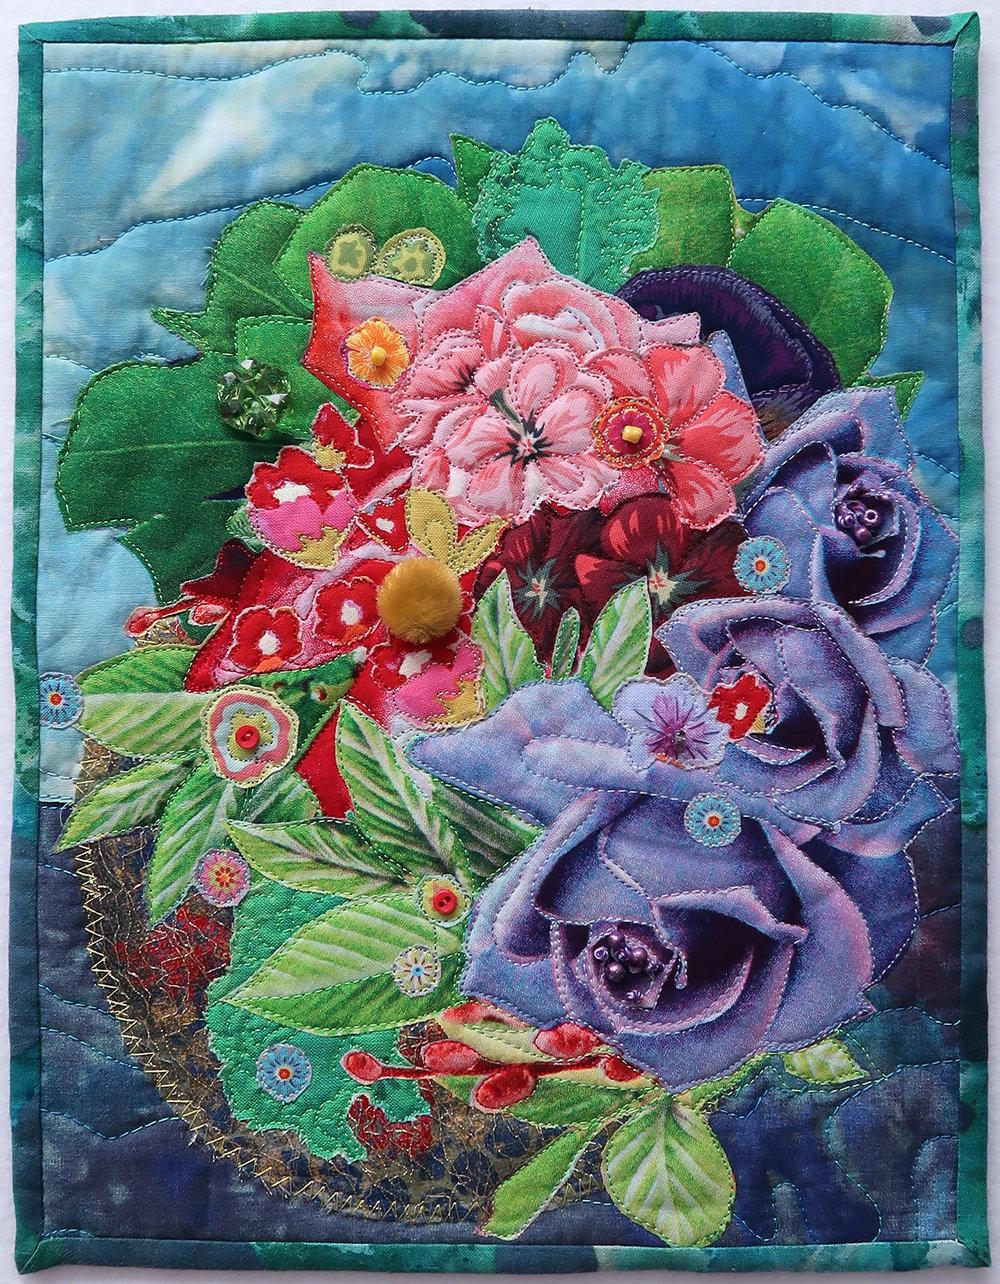 Dean_Cowitz_Alison_Underwater_Bouquet_1.jpg